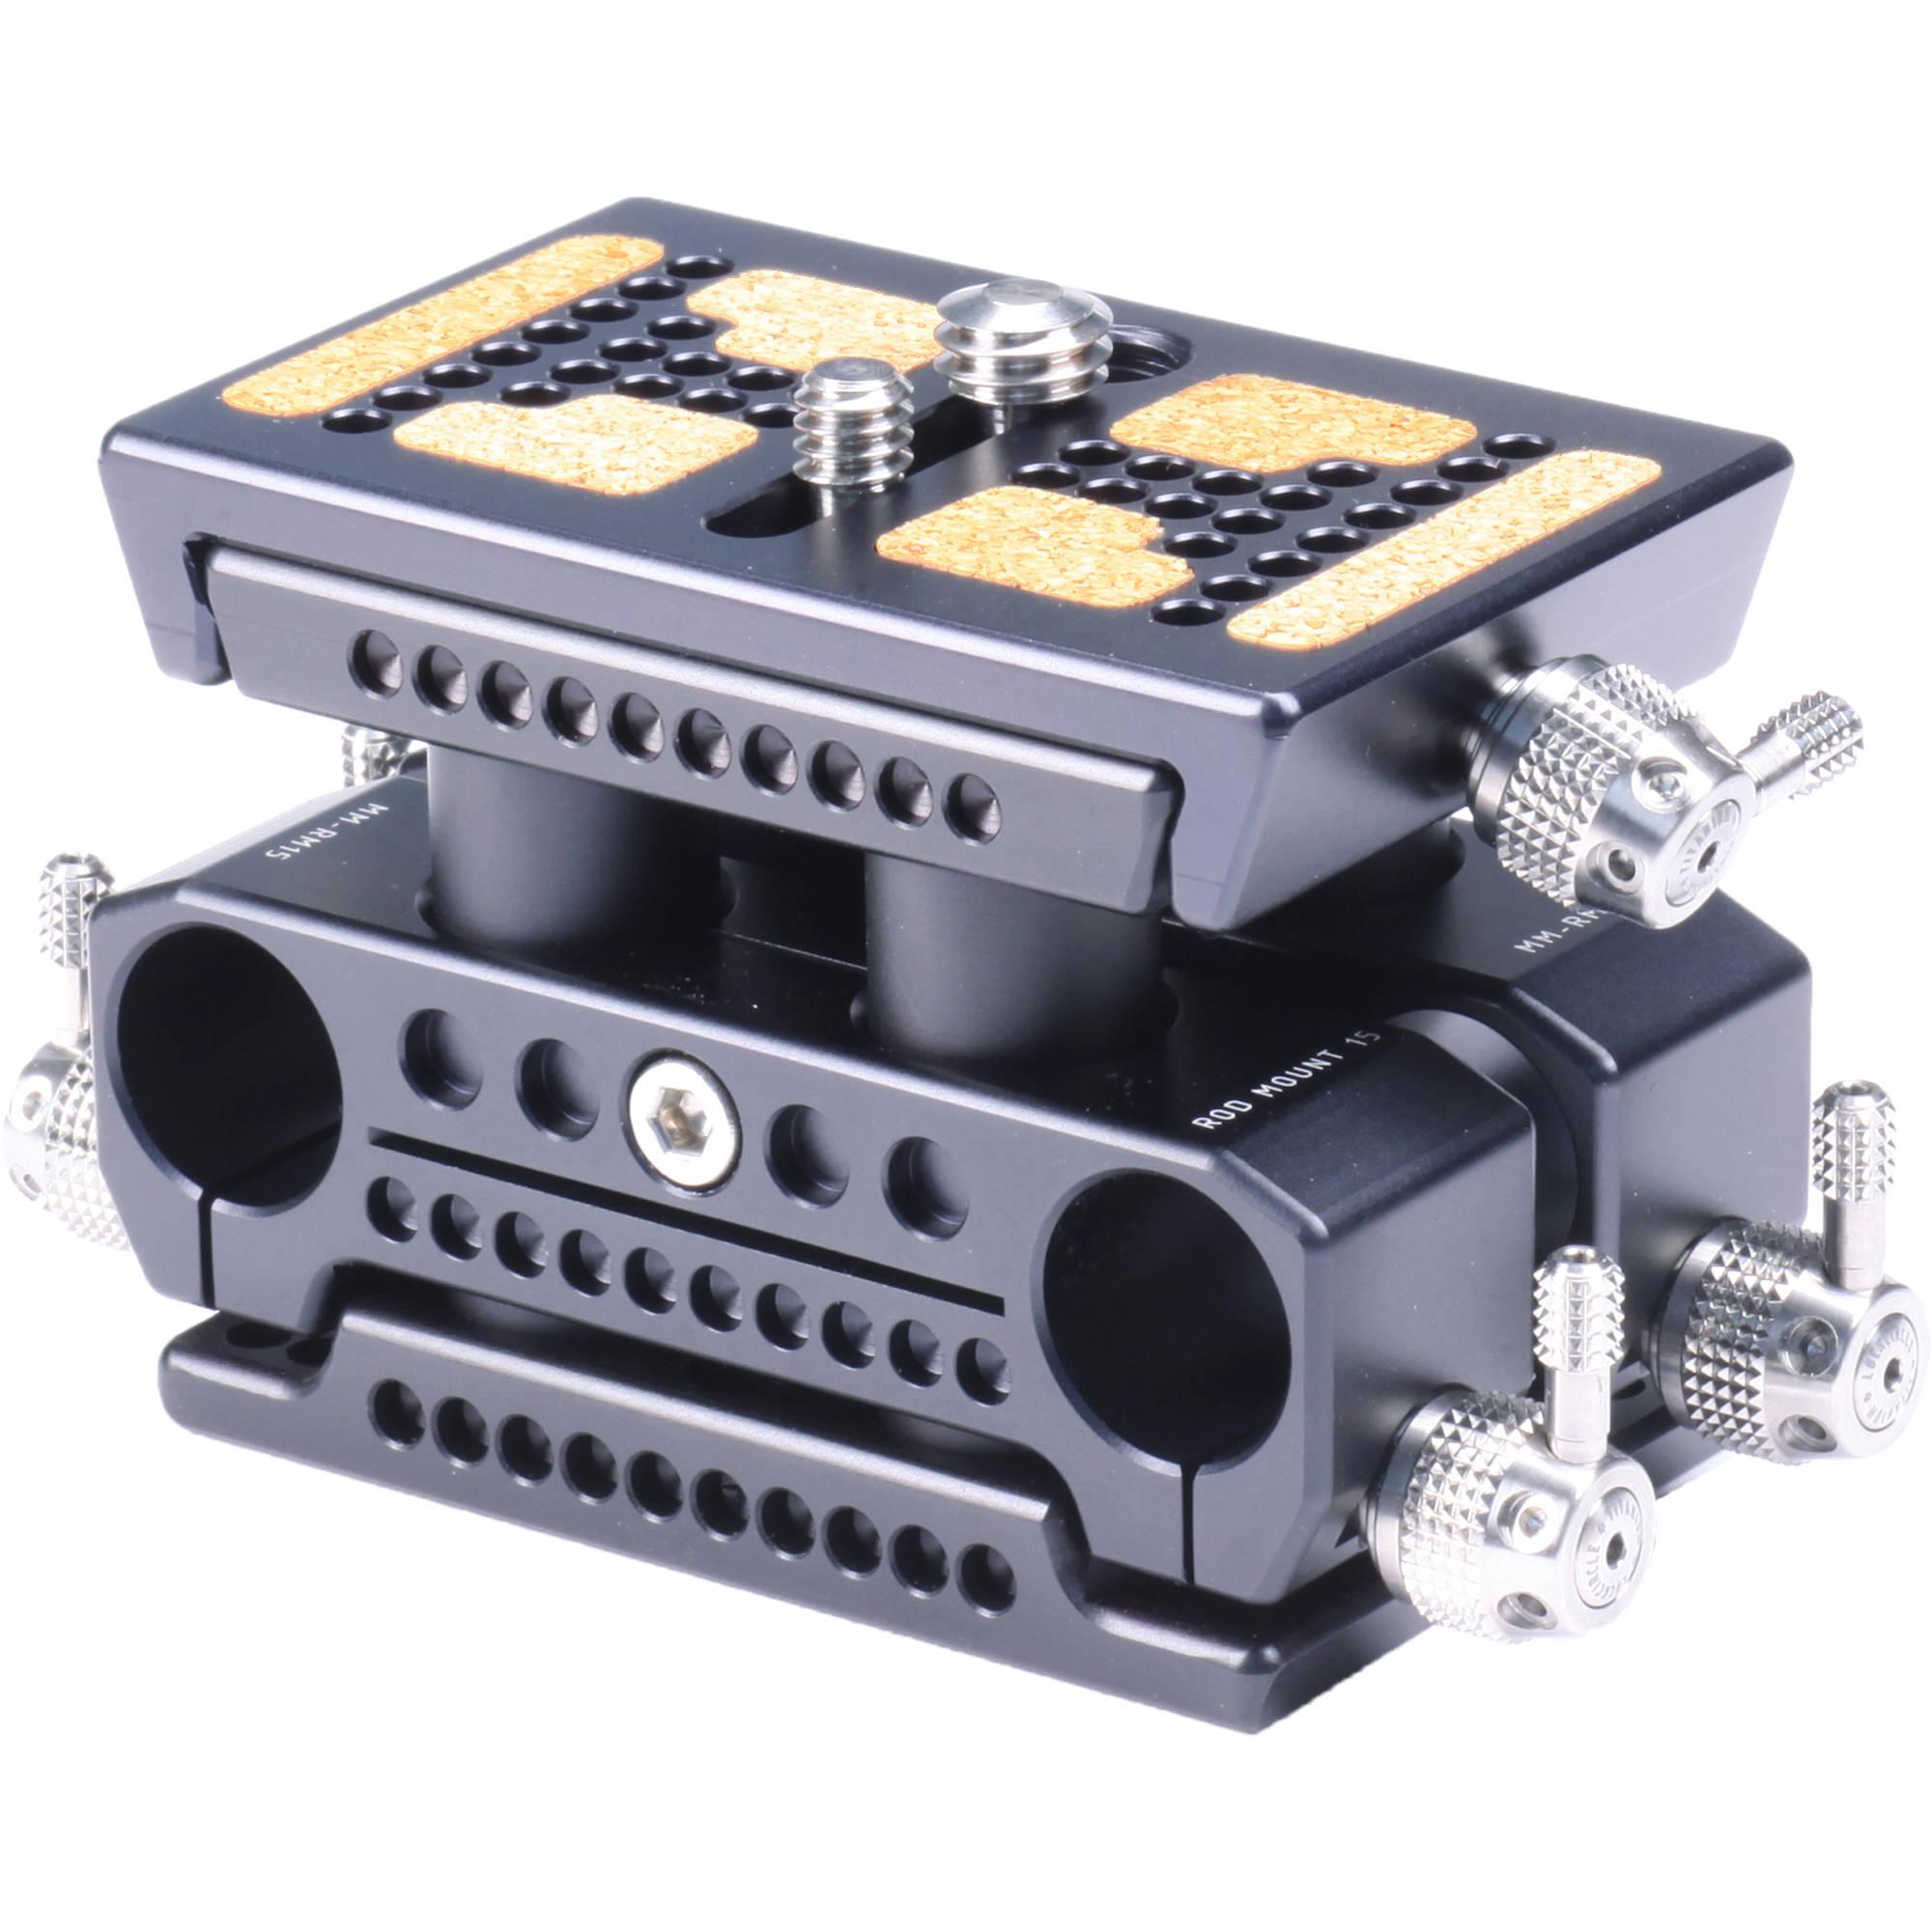 Https C Product 1322260 Reg Vibe Stereo Kit 8 Gauge Amplifier Wiring 1500w Audio Images Lockcircle Lb Bb Baseplate Mj 1372051